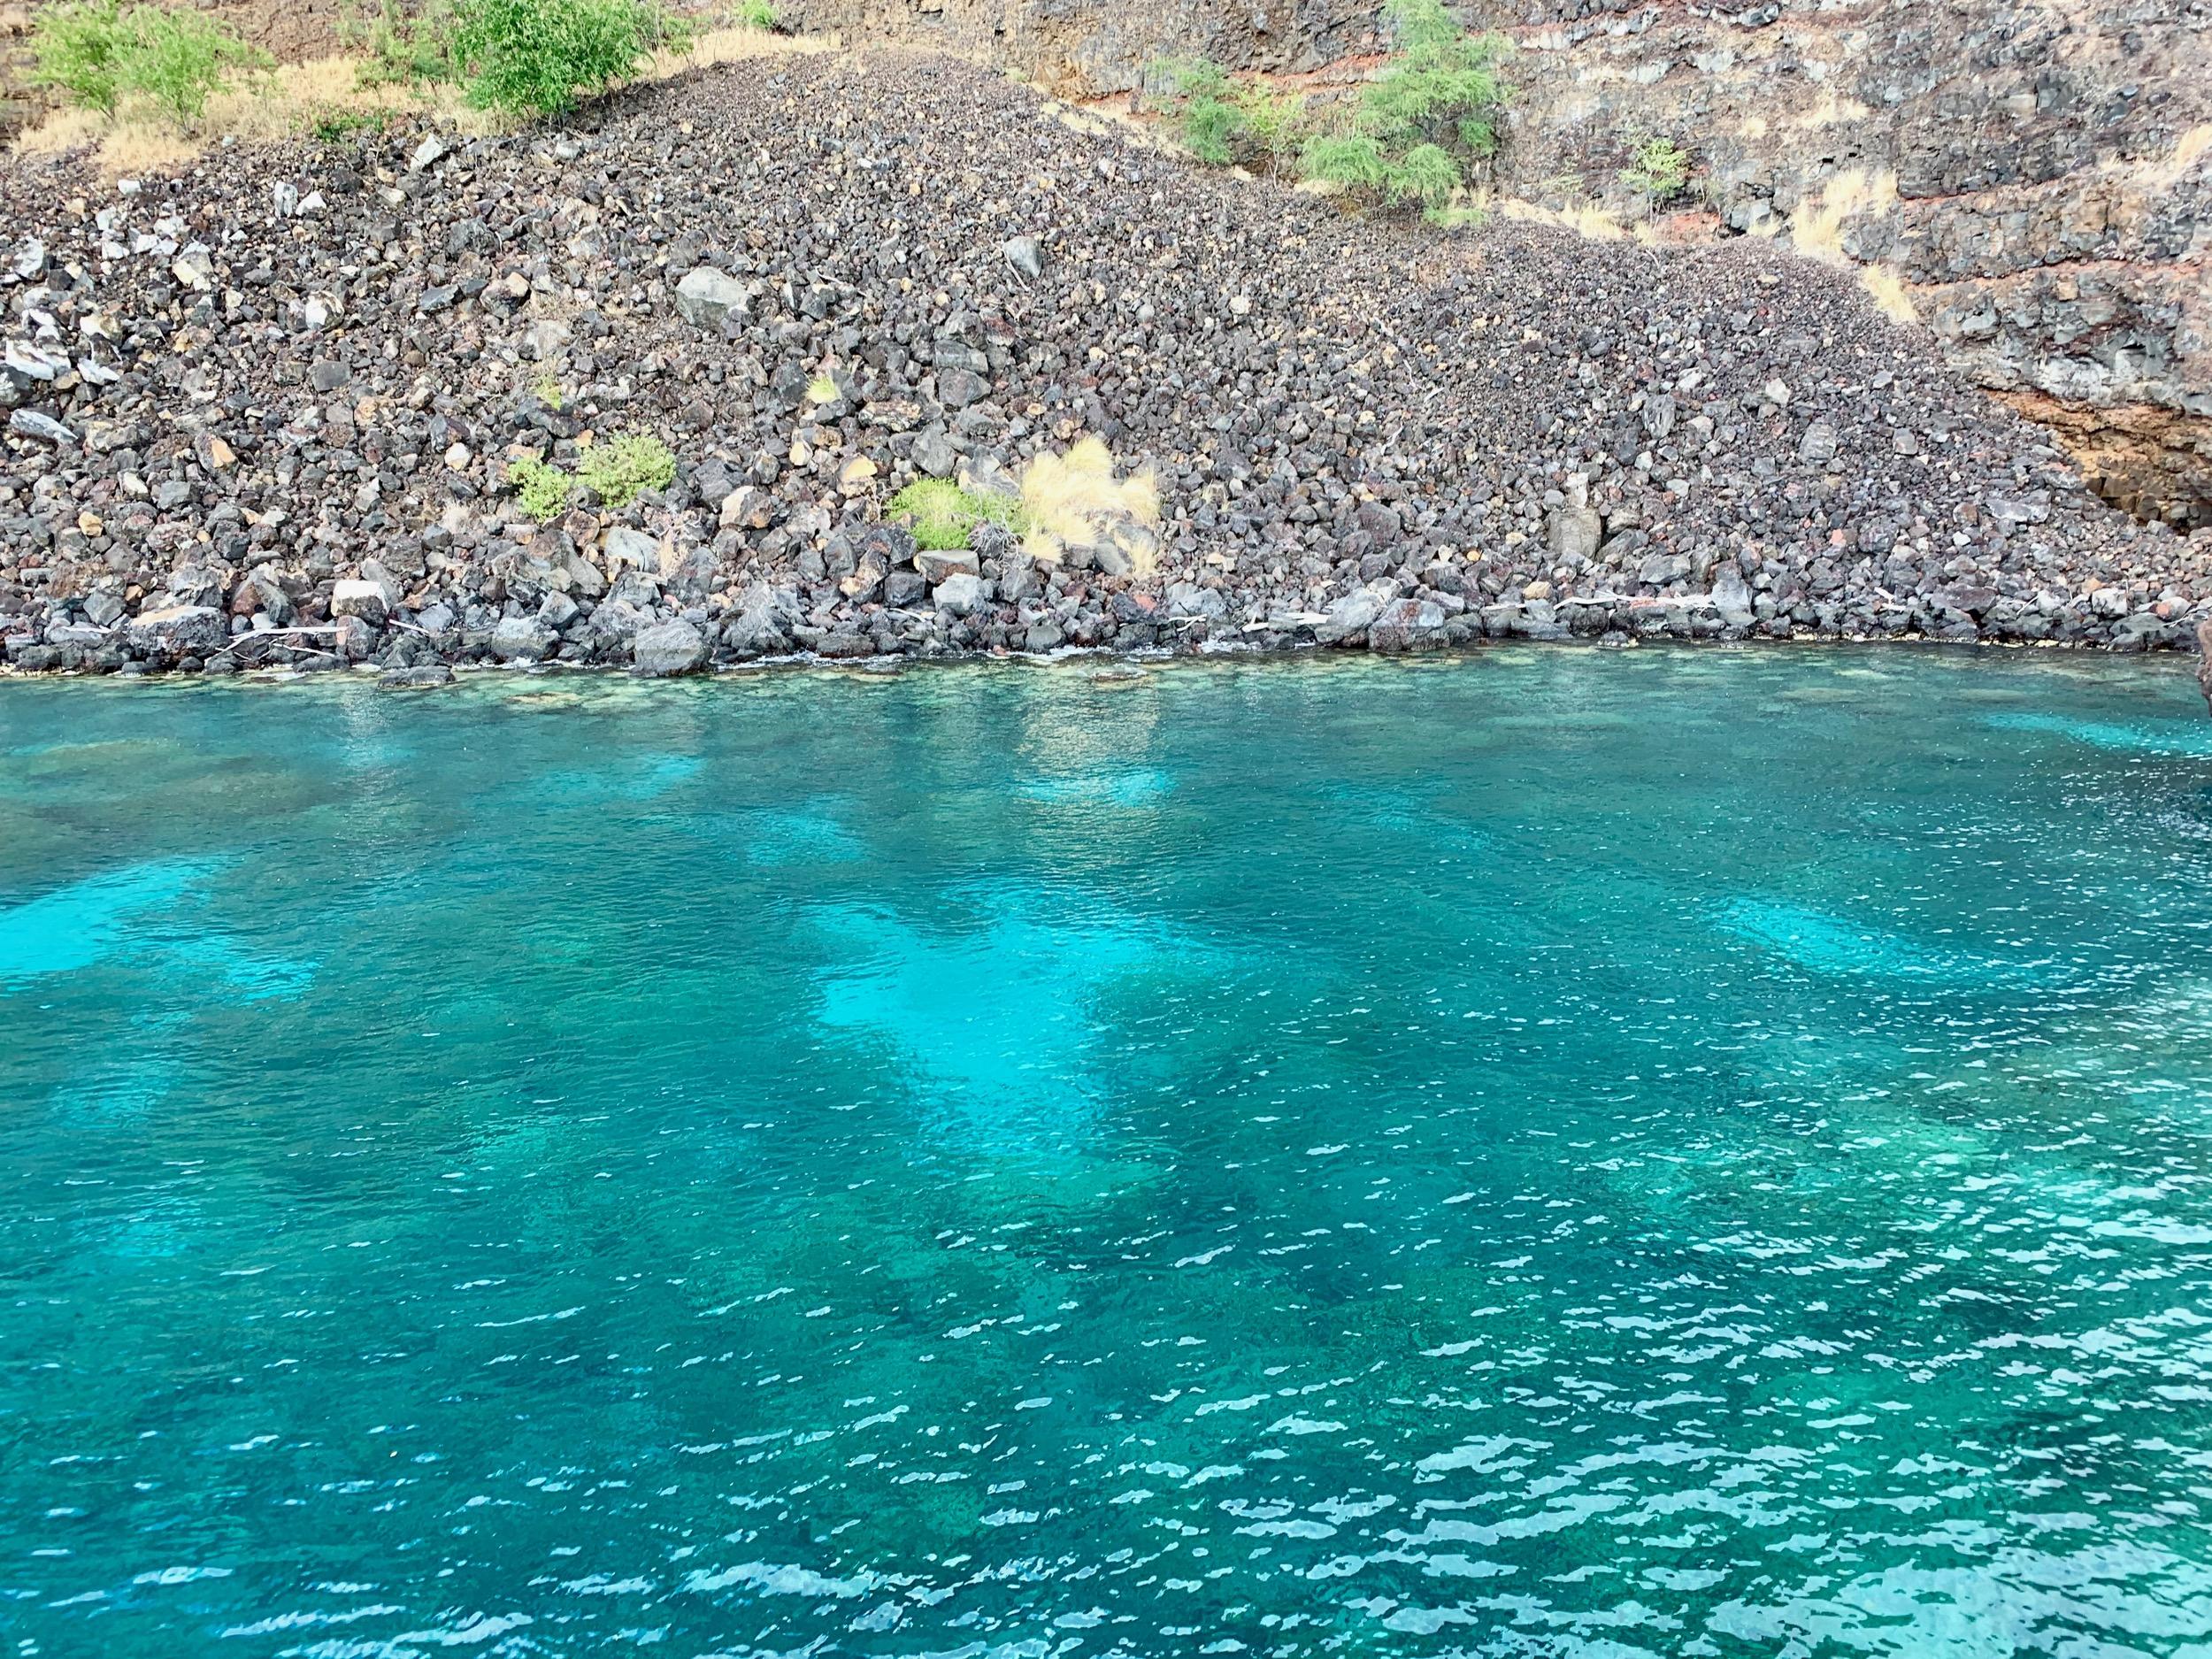 Kealakekua Bay Water